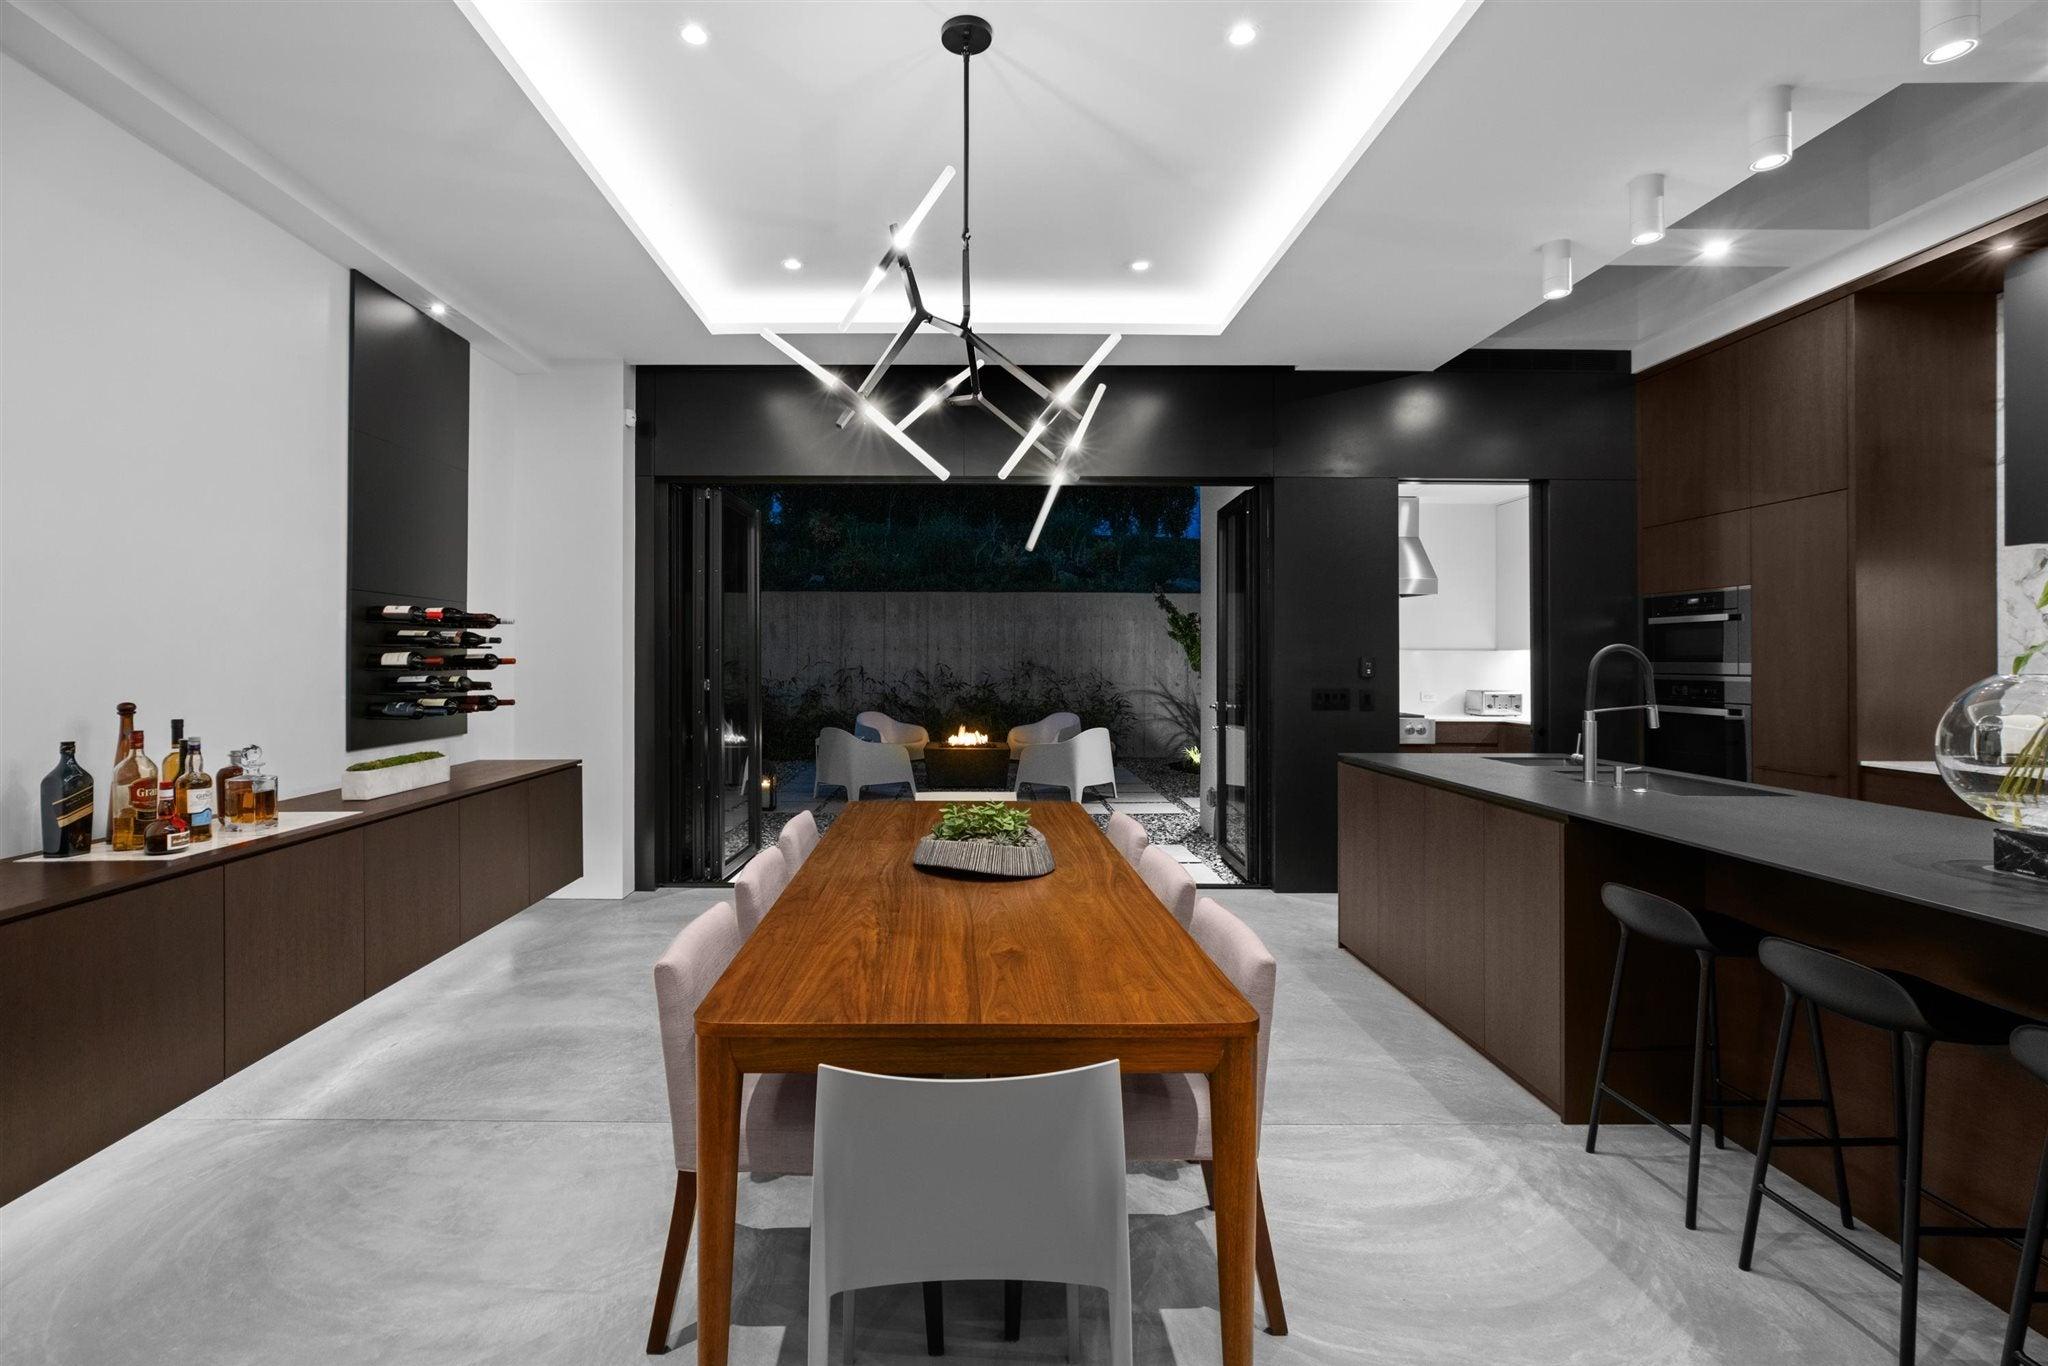 276 SANDRINGHAM CRESCENT - Upper Lonsdale House/Single Family for sale, 7 Bedrooms (R2617703) - #15